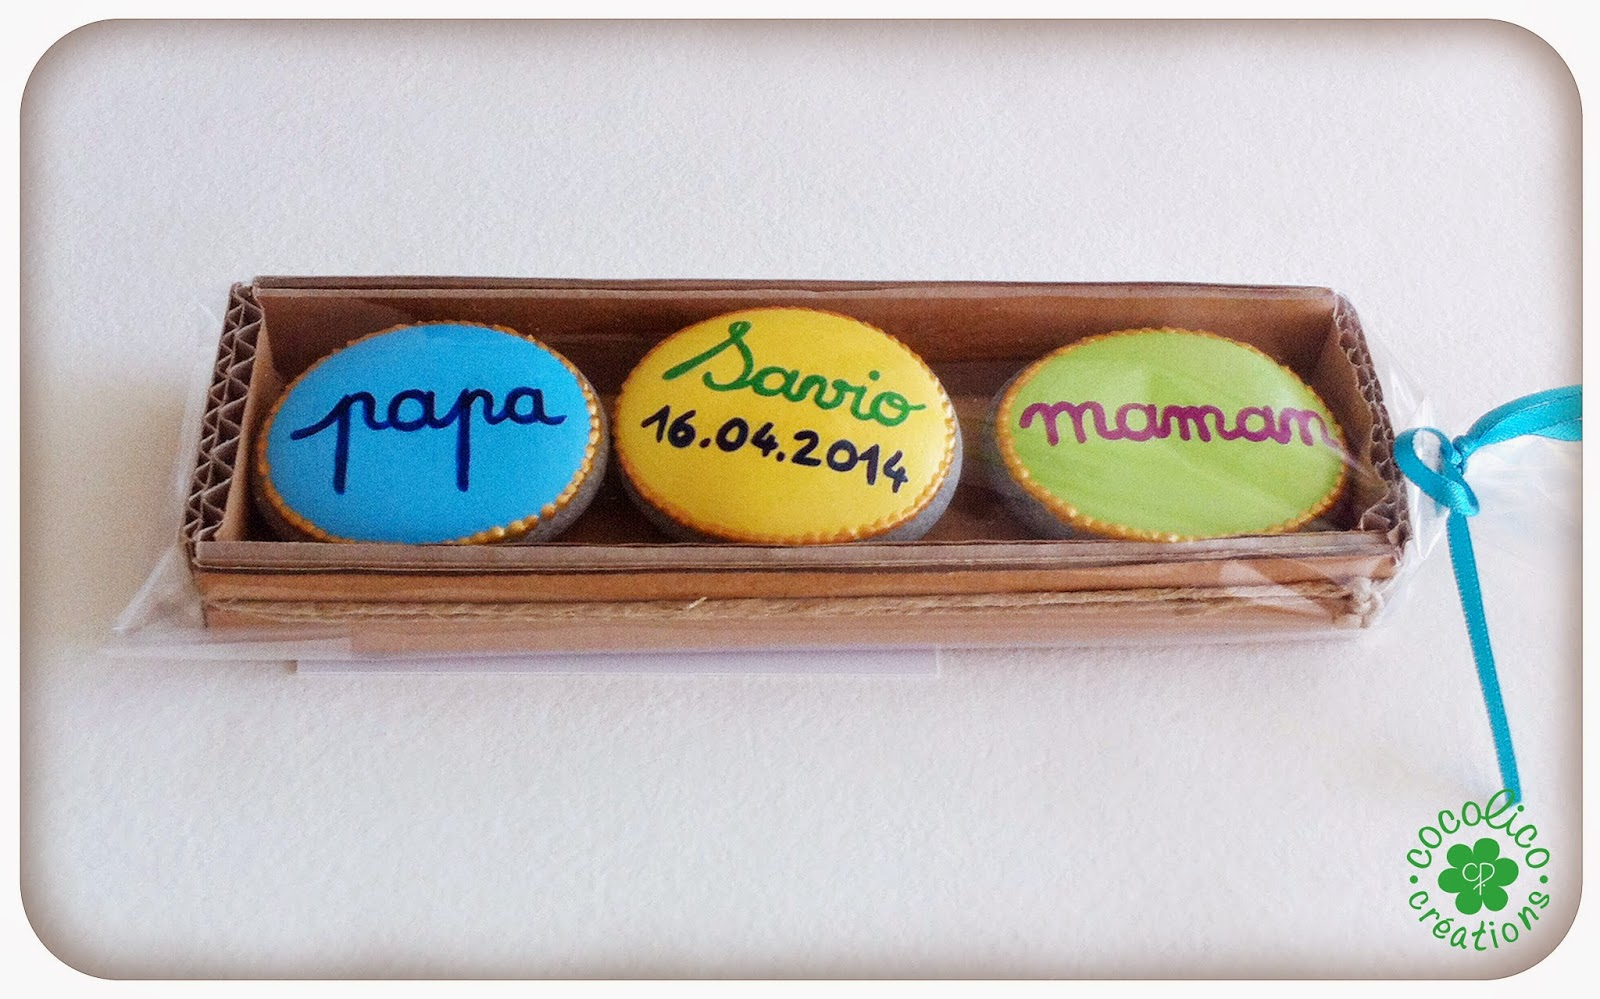 cocolico creations cadeau de naissance petits galets magnets. Black Bedroom Furniture Sets. Home Design Ideas